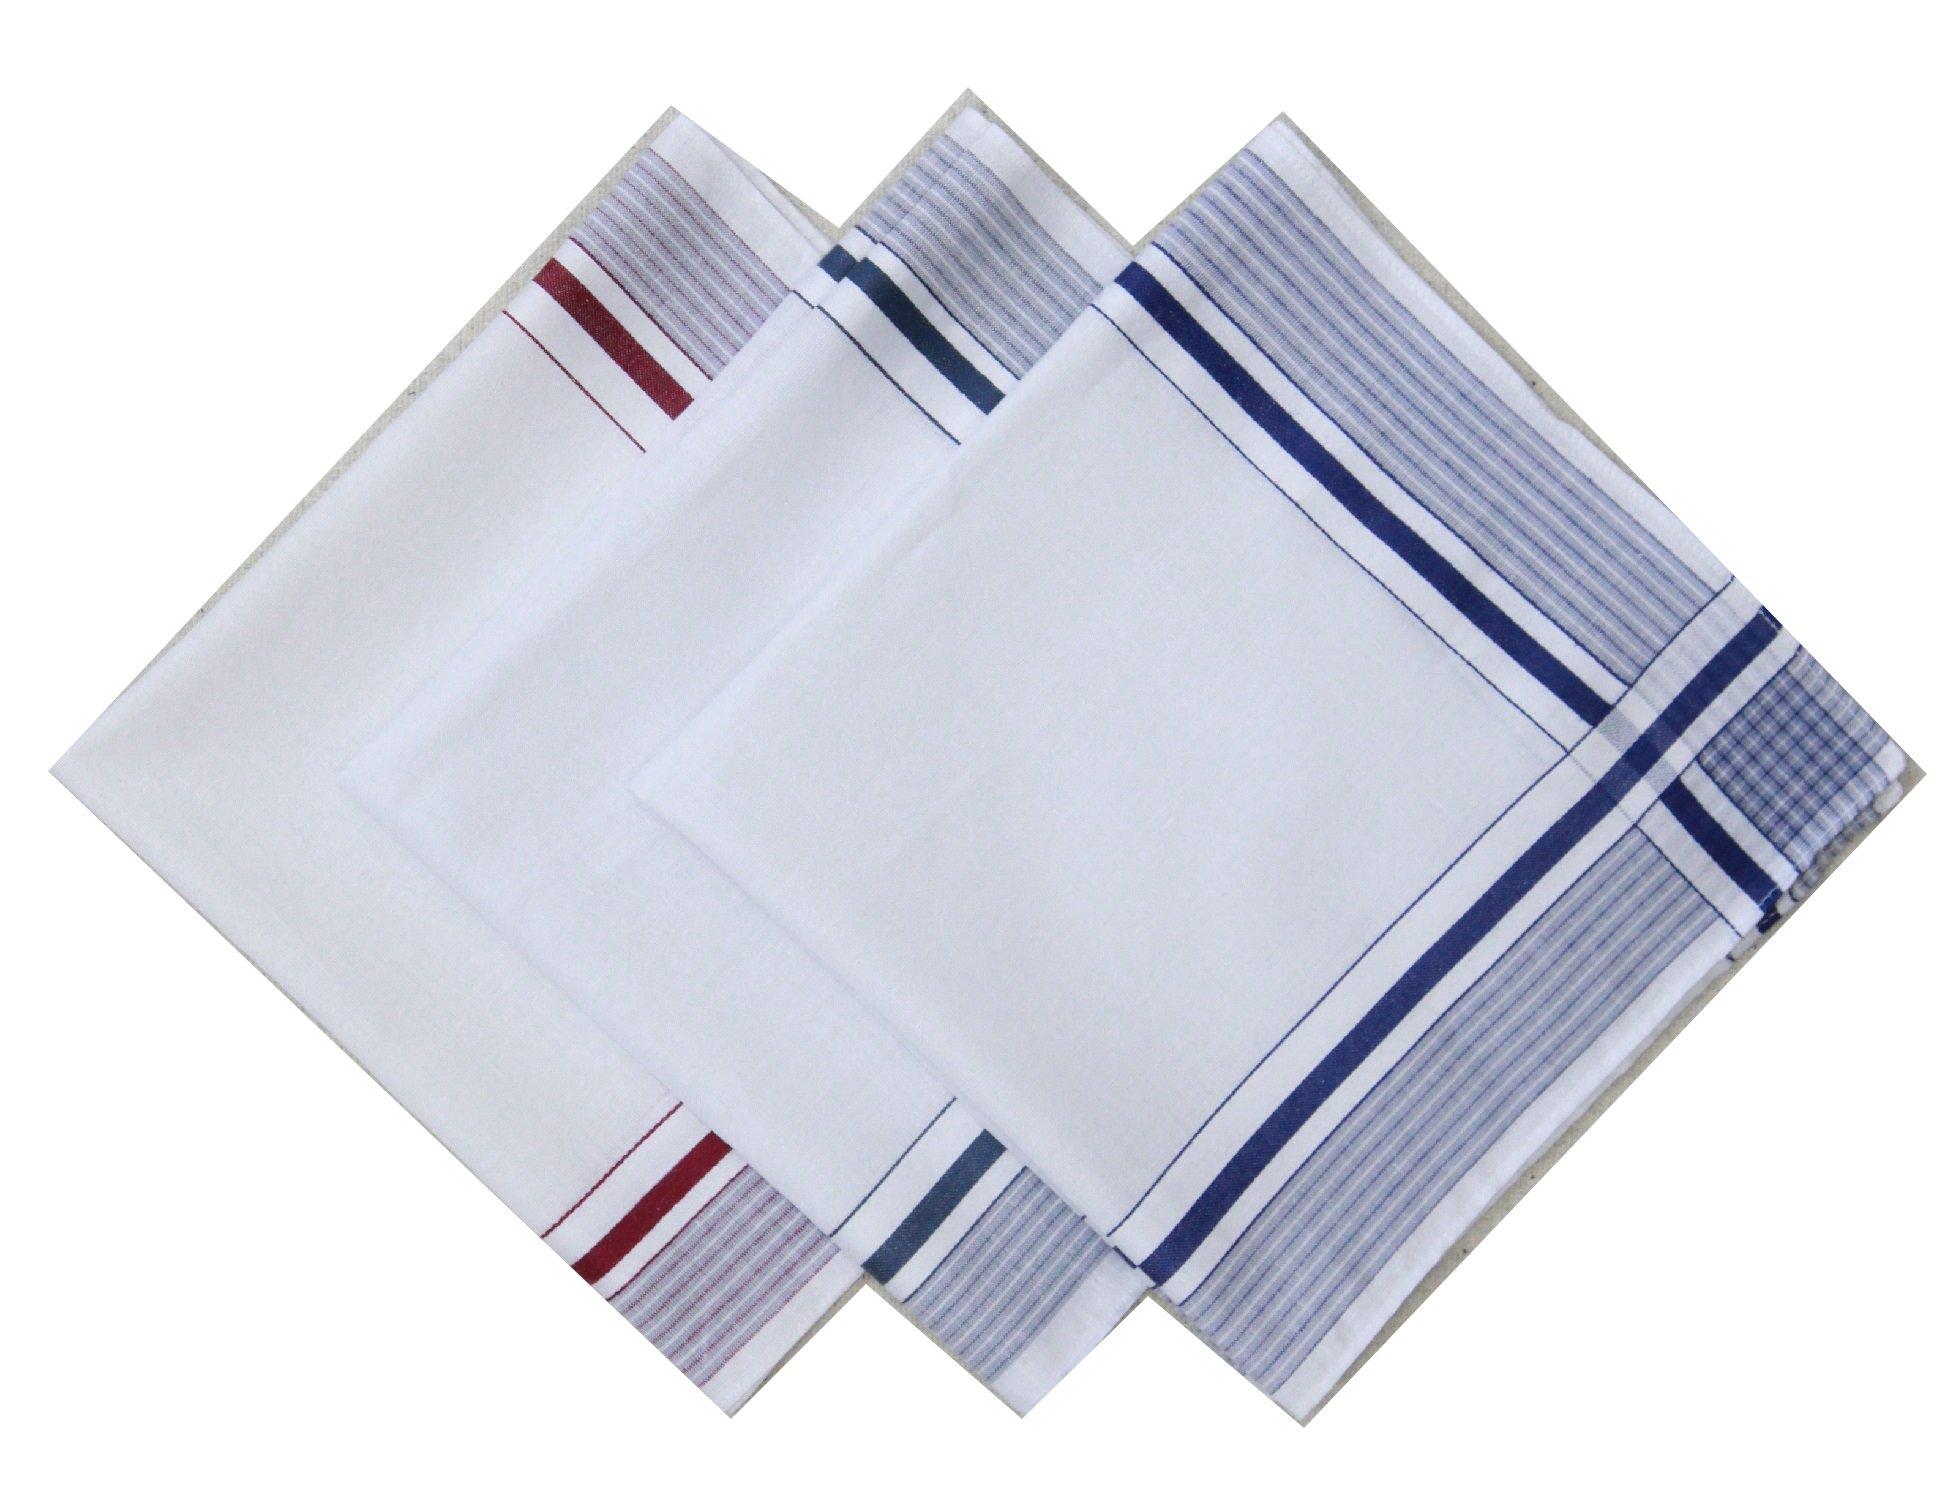 Blank&Black 100% Cotton Men's Handkerchief 3 Piece Gift Set Assorted Pack, 10, 40S